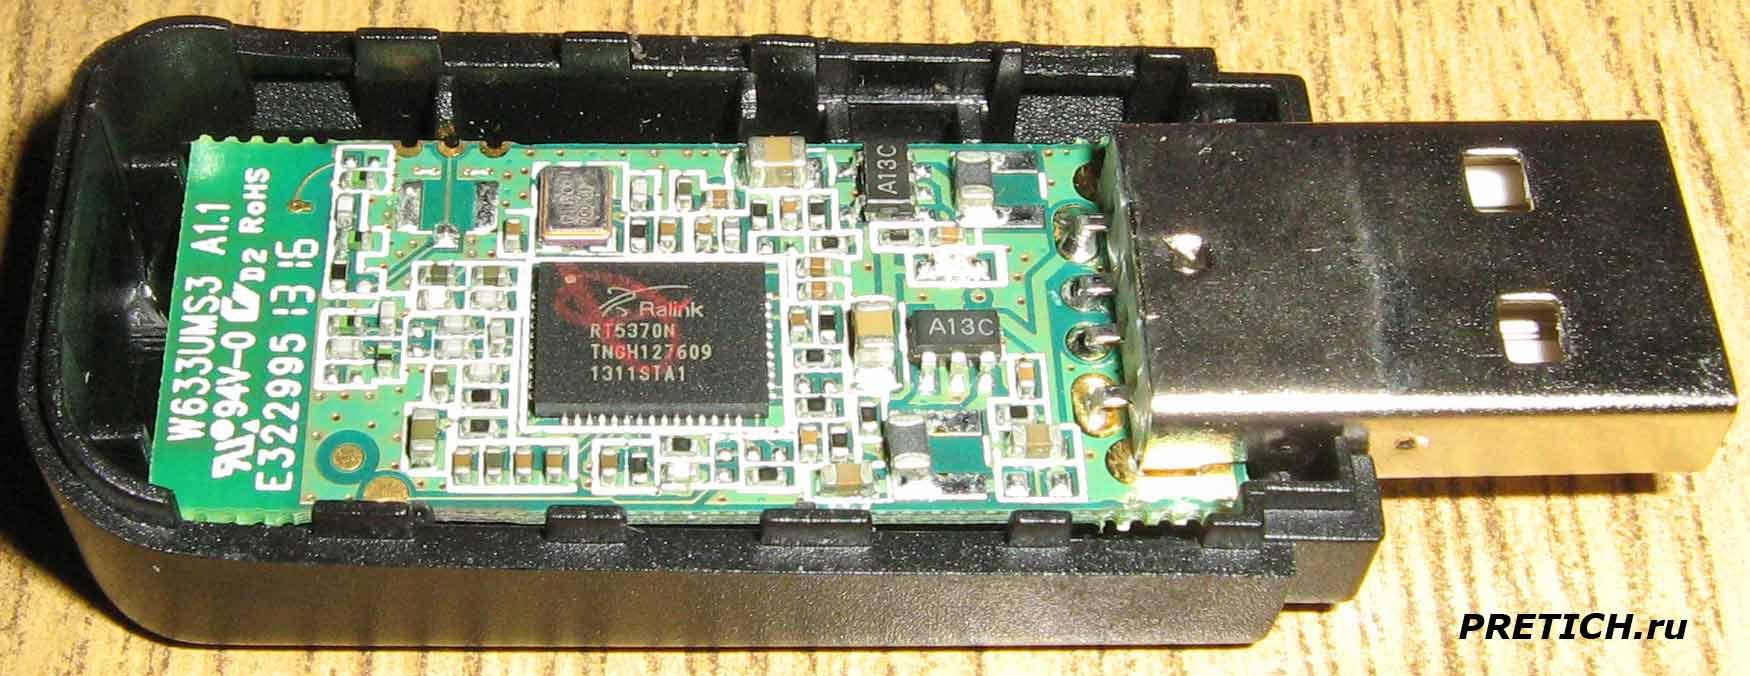 Претич - Статьи: Ralink RT5370N USB адаптер Wi-Fi